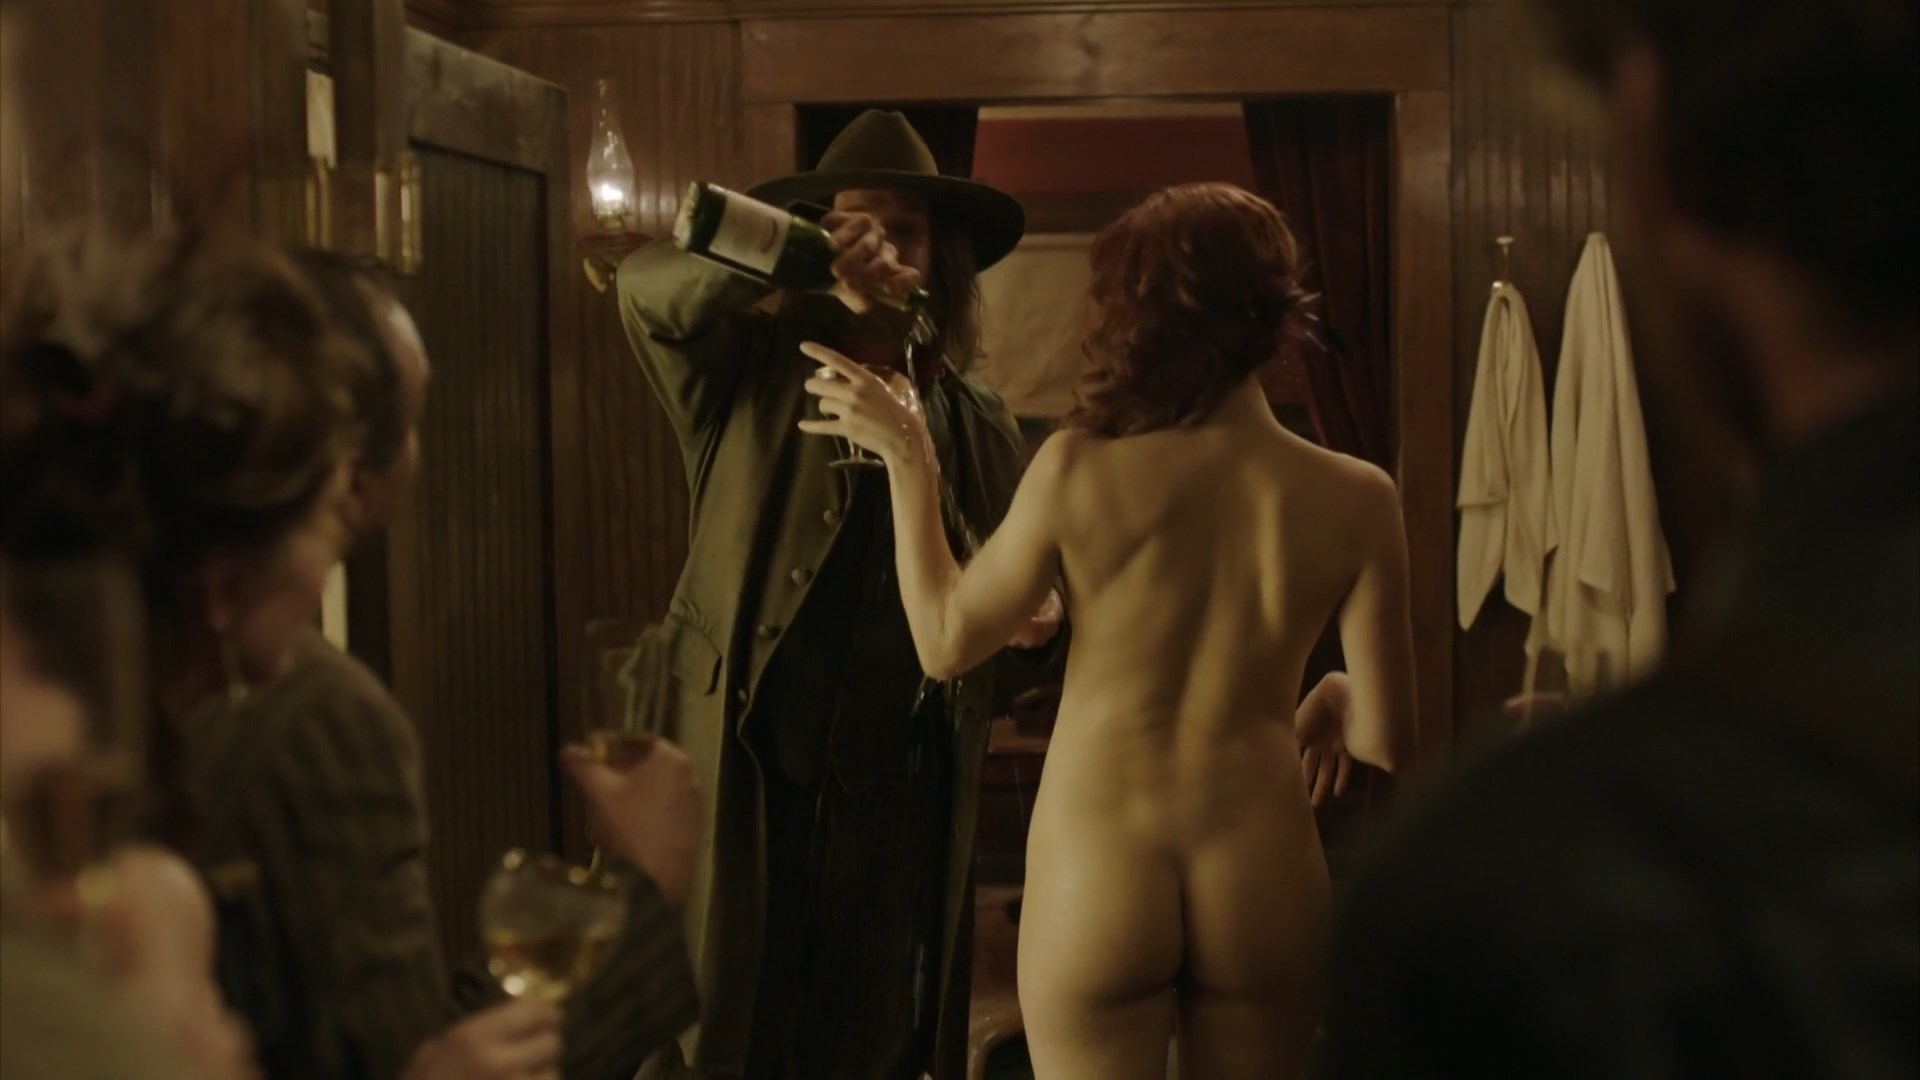 Nude conor leslie Conor Leslie